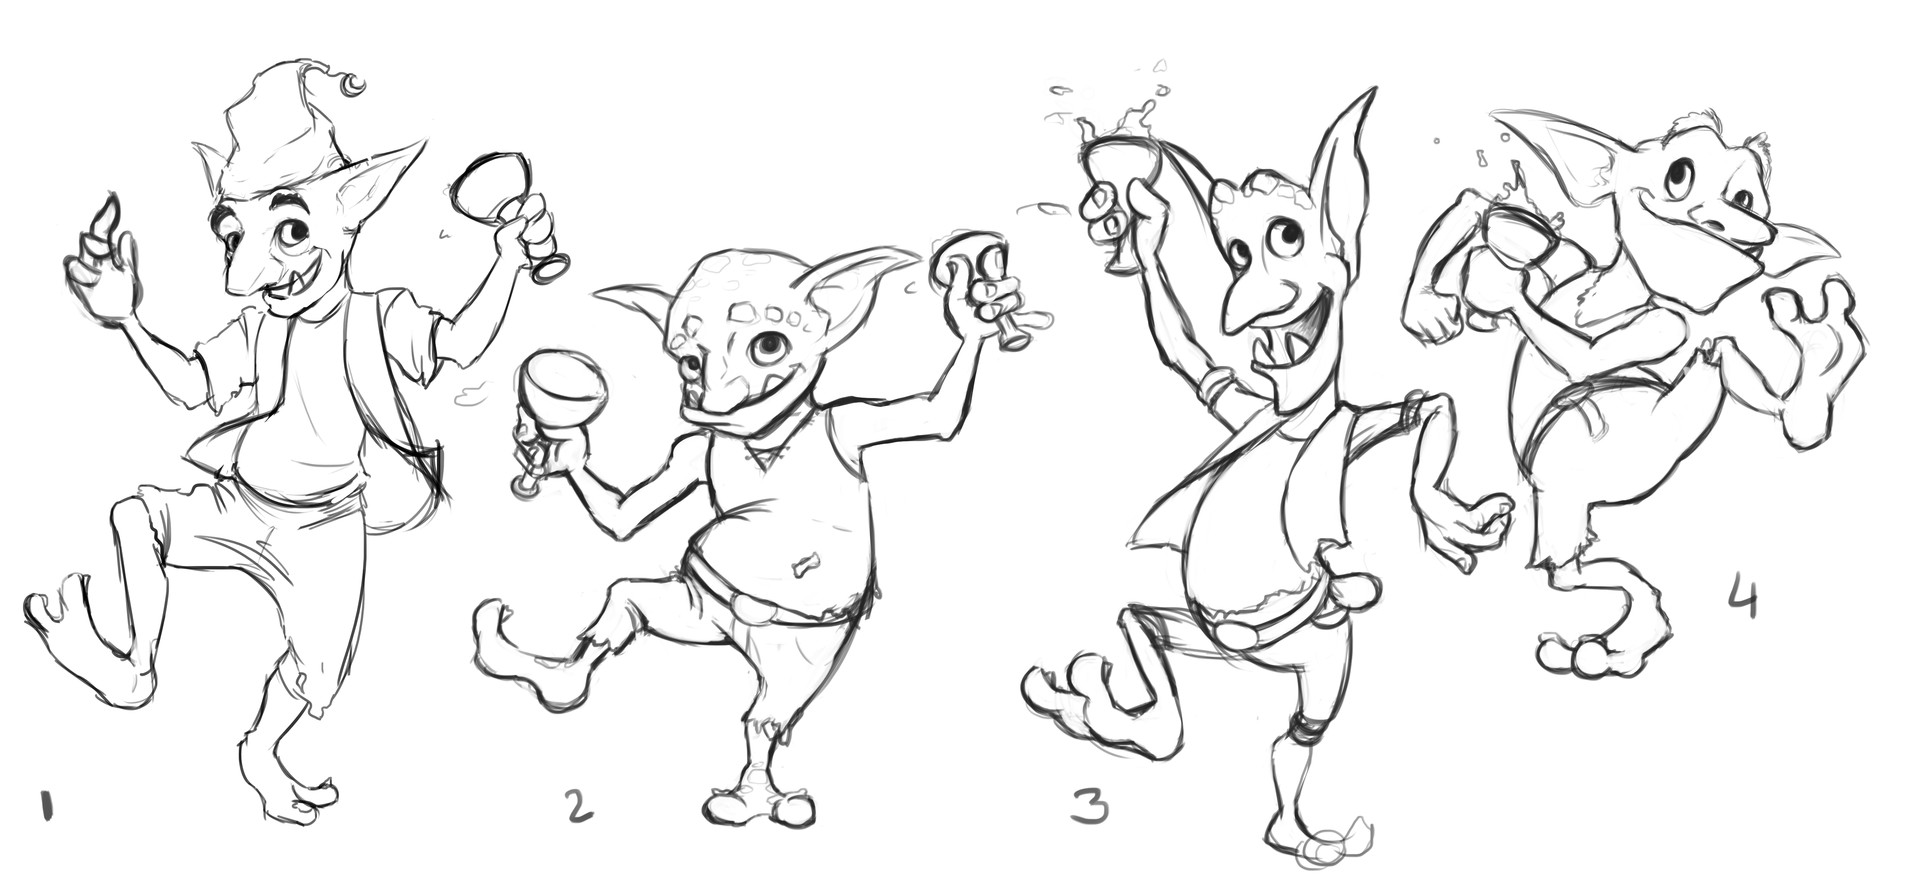 Victoria march sketches goblin